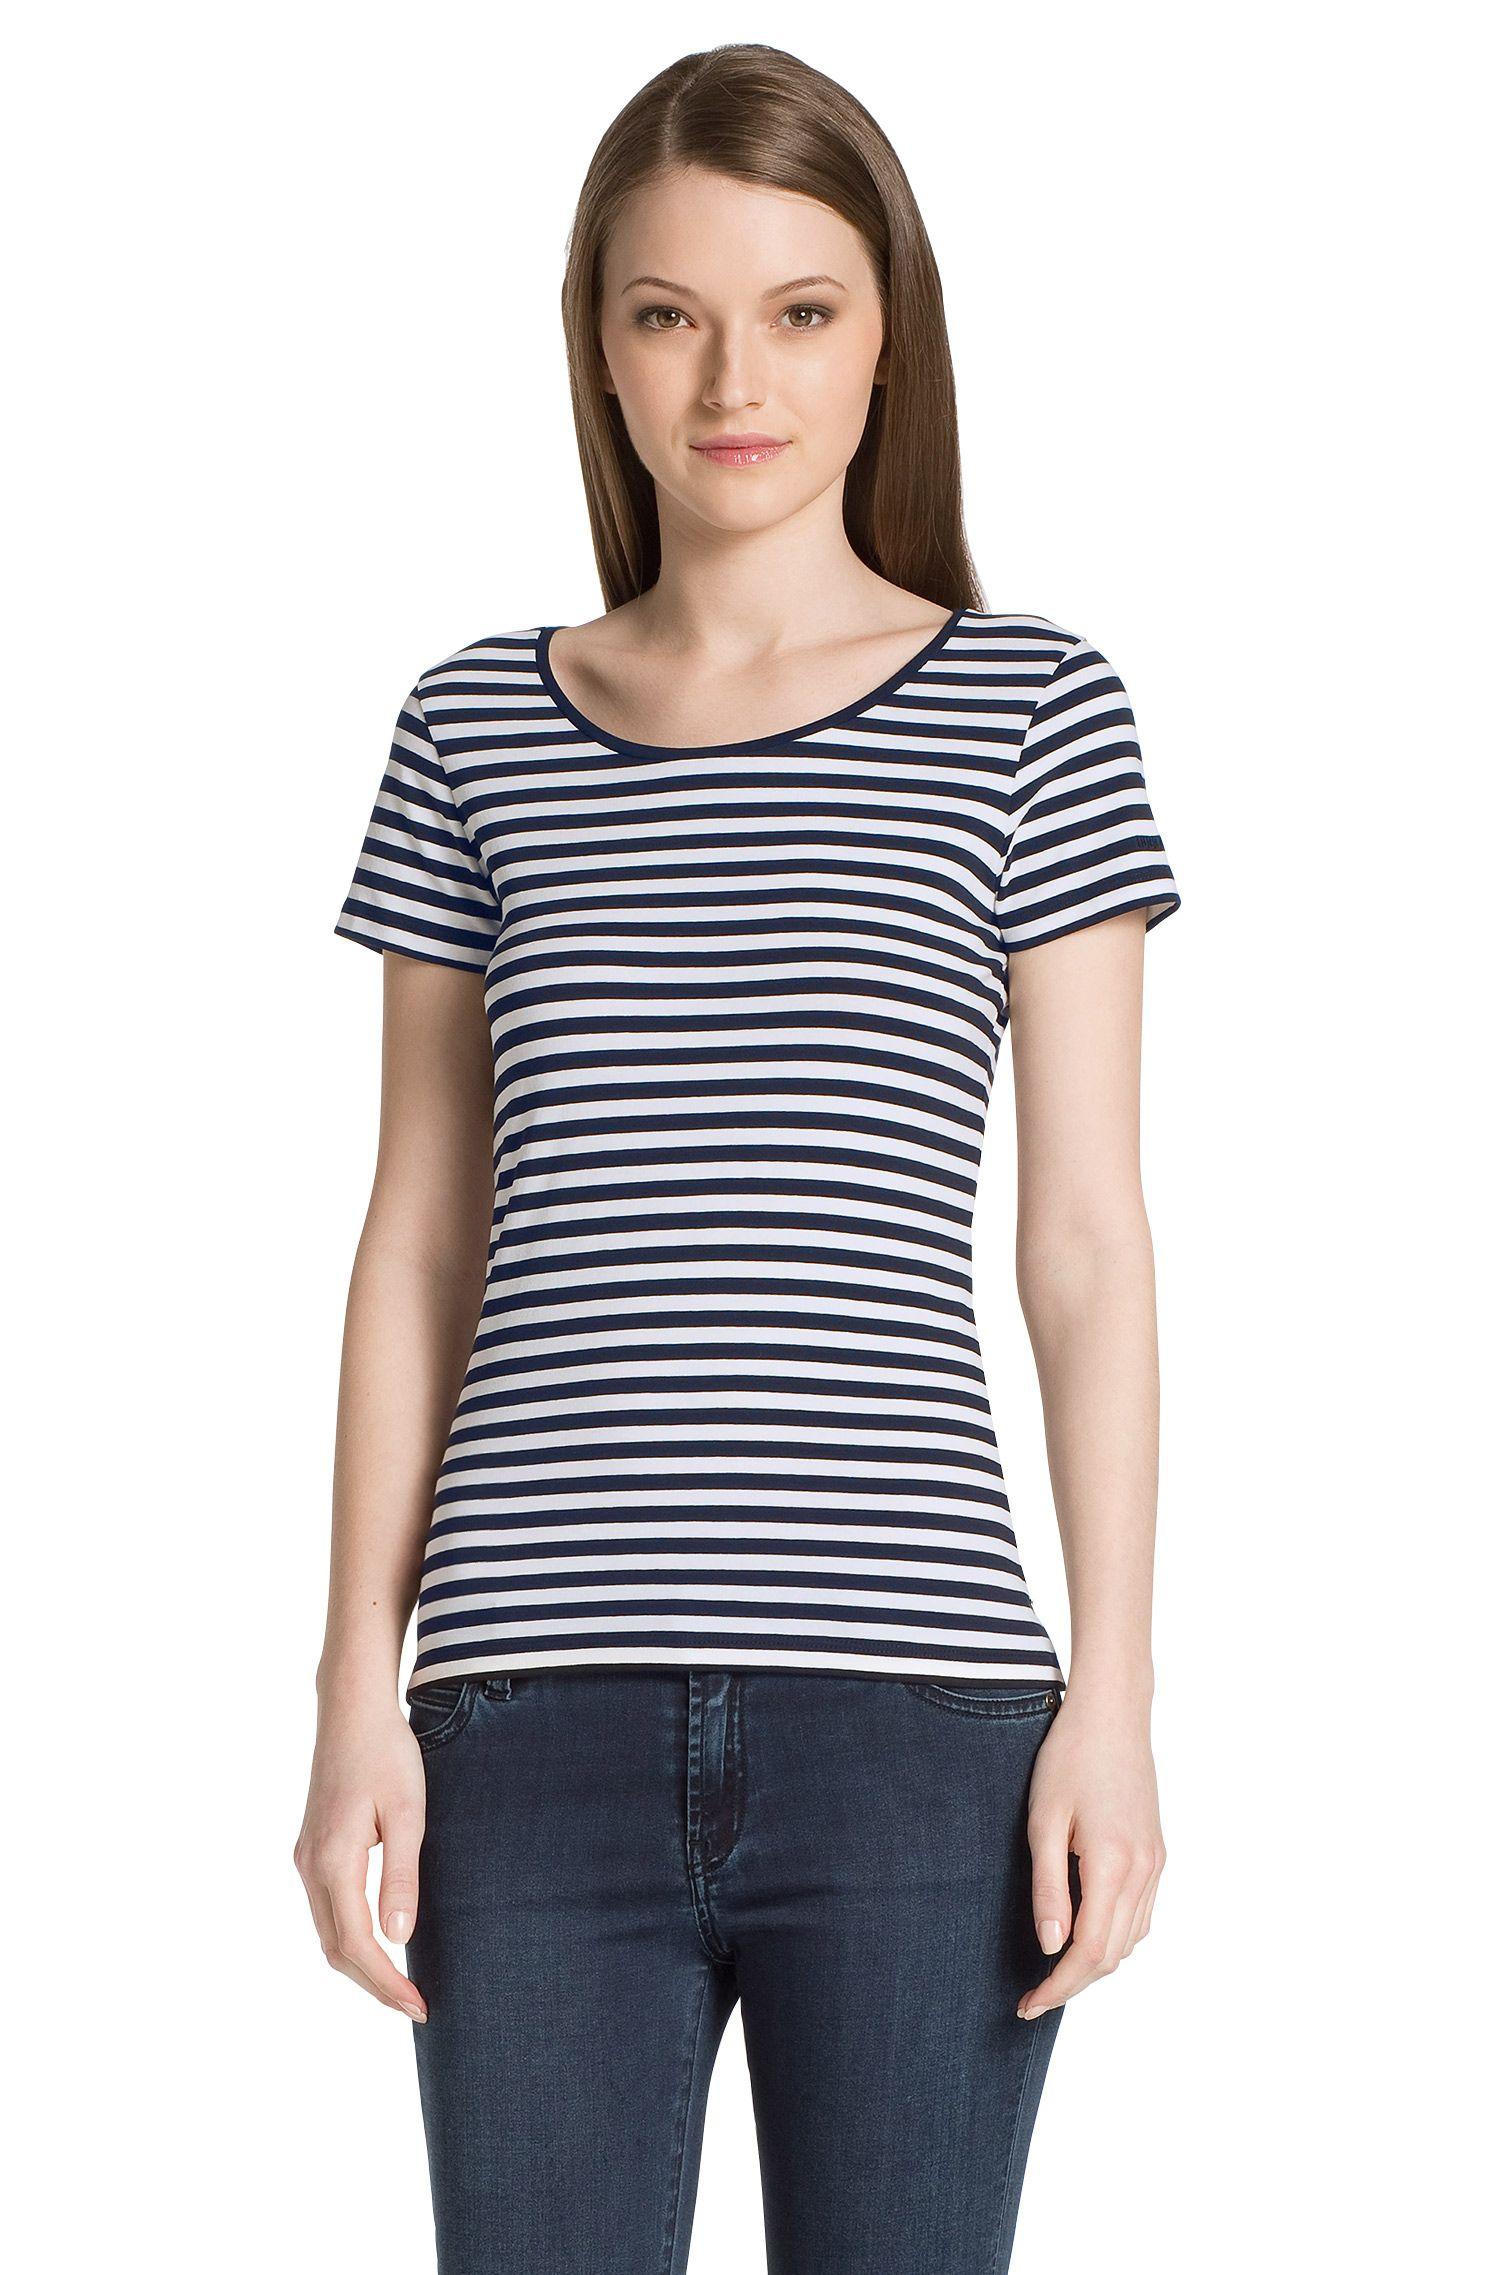 T-Shirt ´Debia_2` aus Baumwoll-Mix